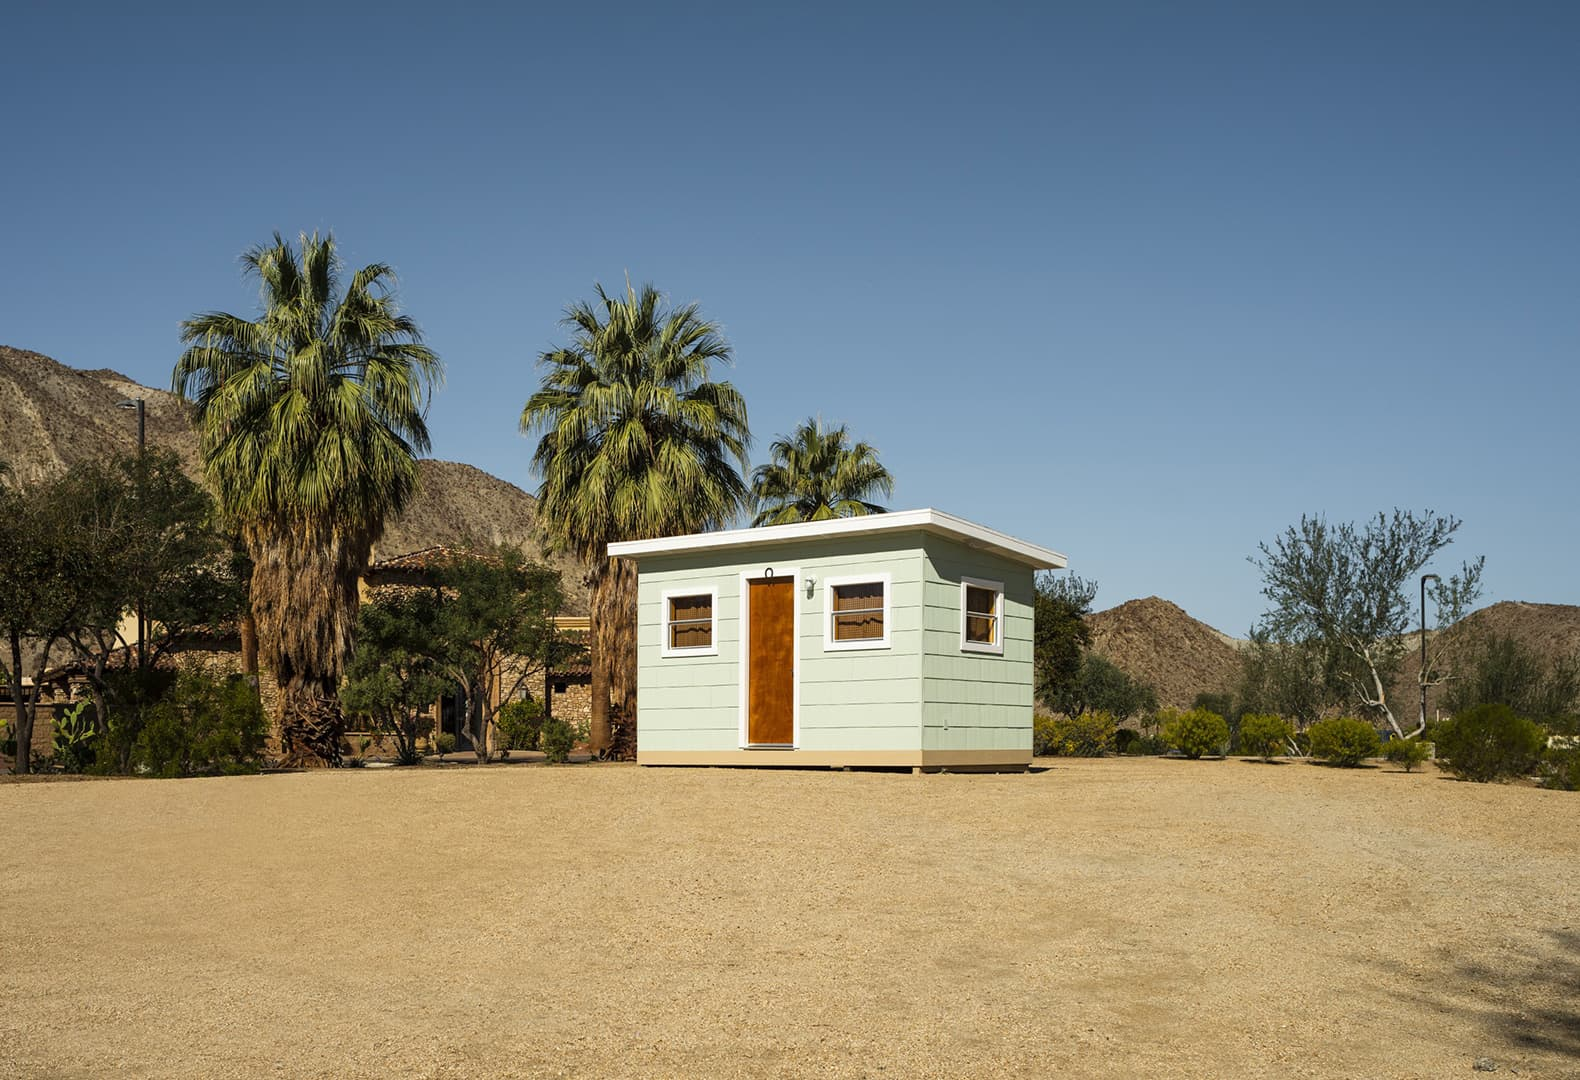 Desert X 2021. Kim Stringfellow, Jackrabbit Homestead